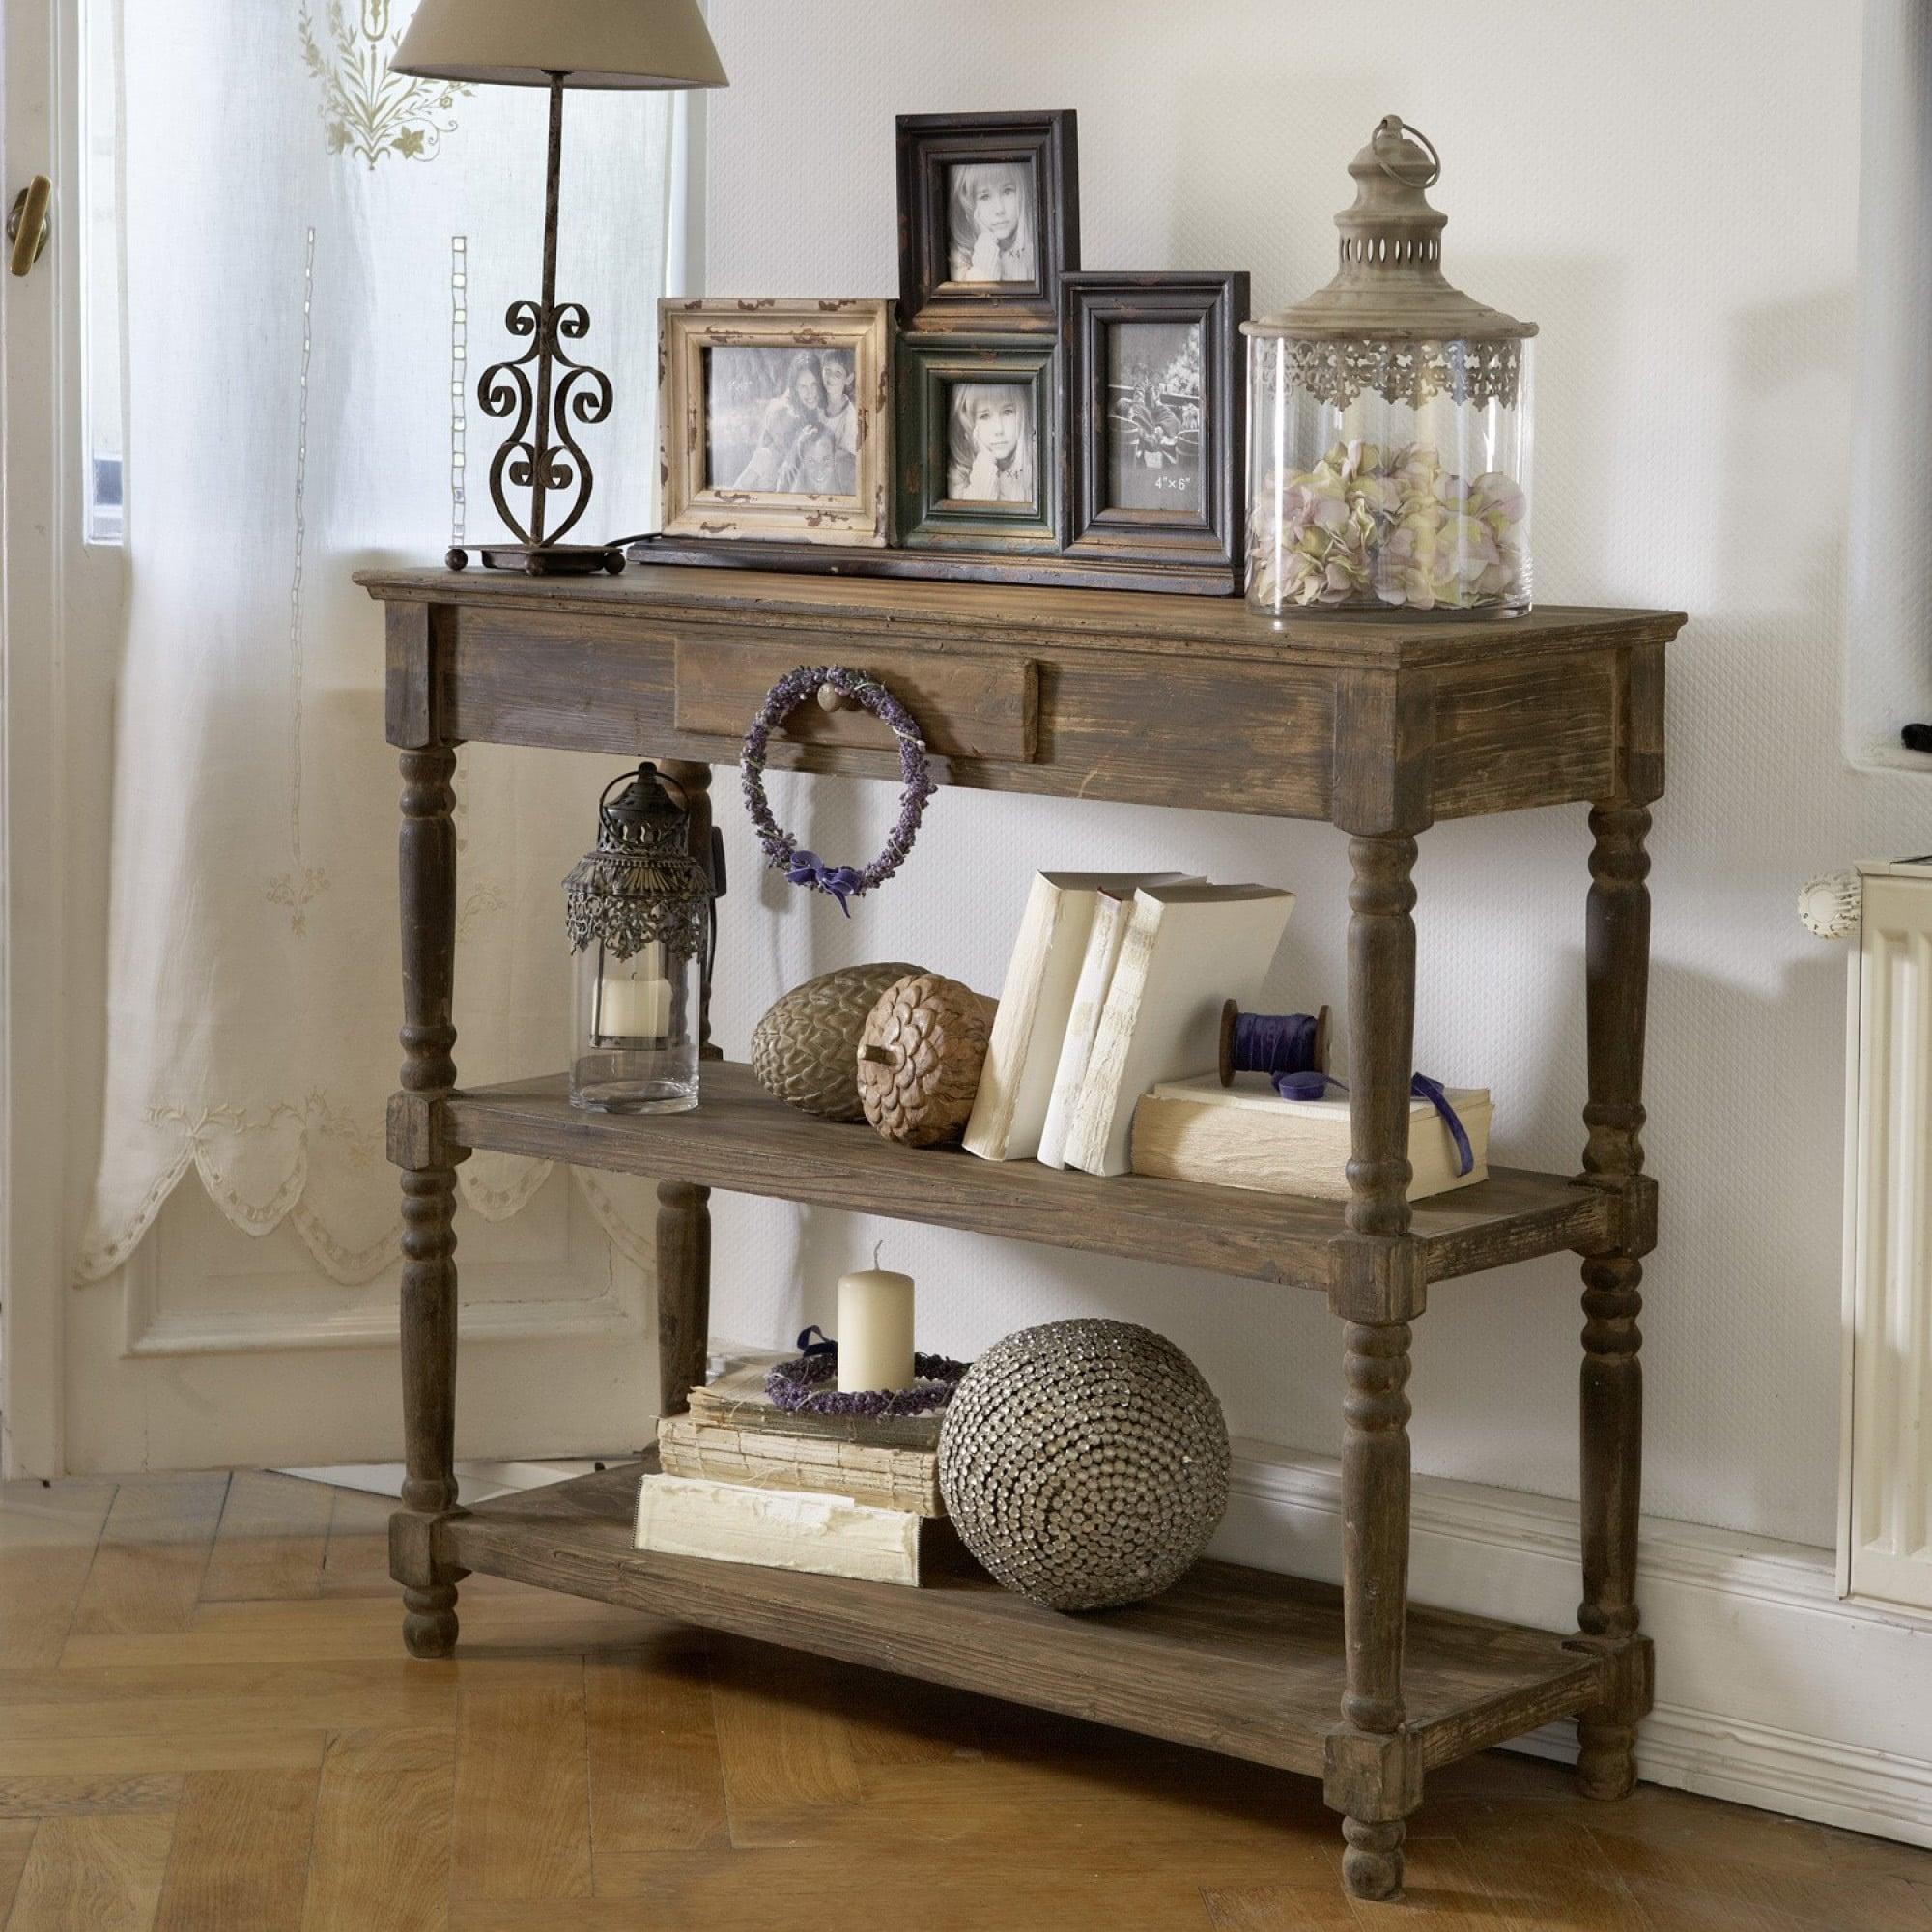 konsole roubaix loberon coming home. Black Bedroom Furniture Sets. Home Design Ideas